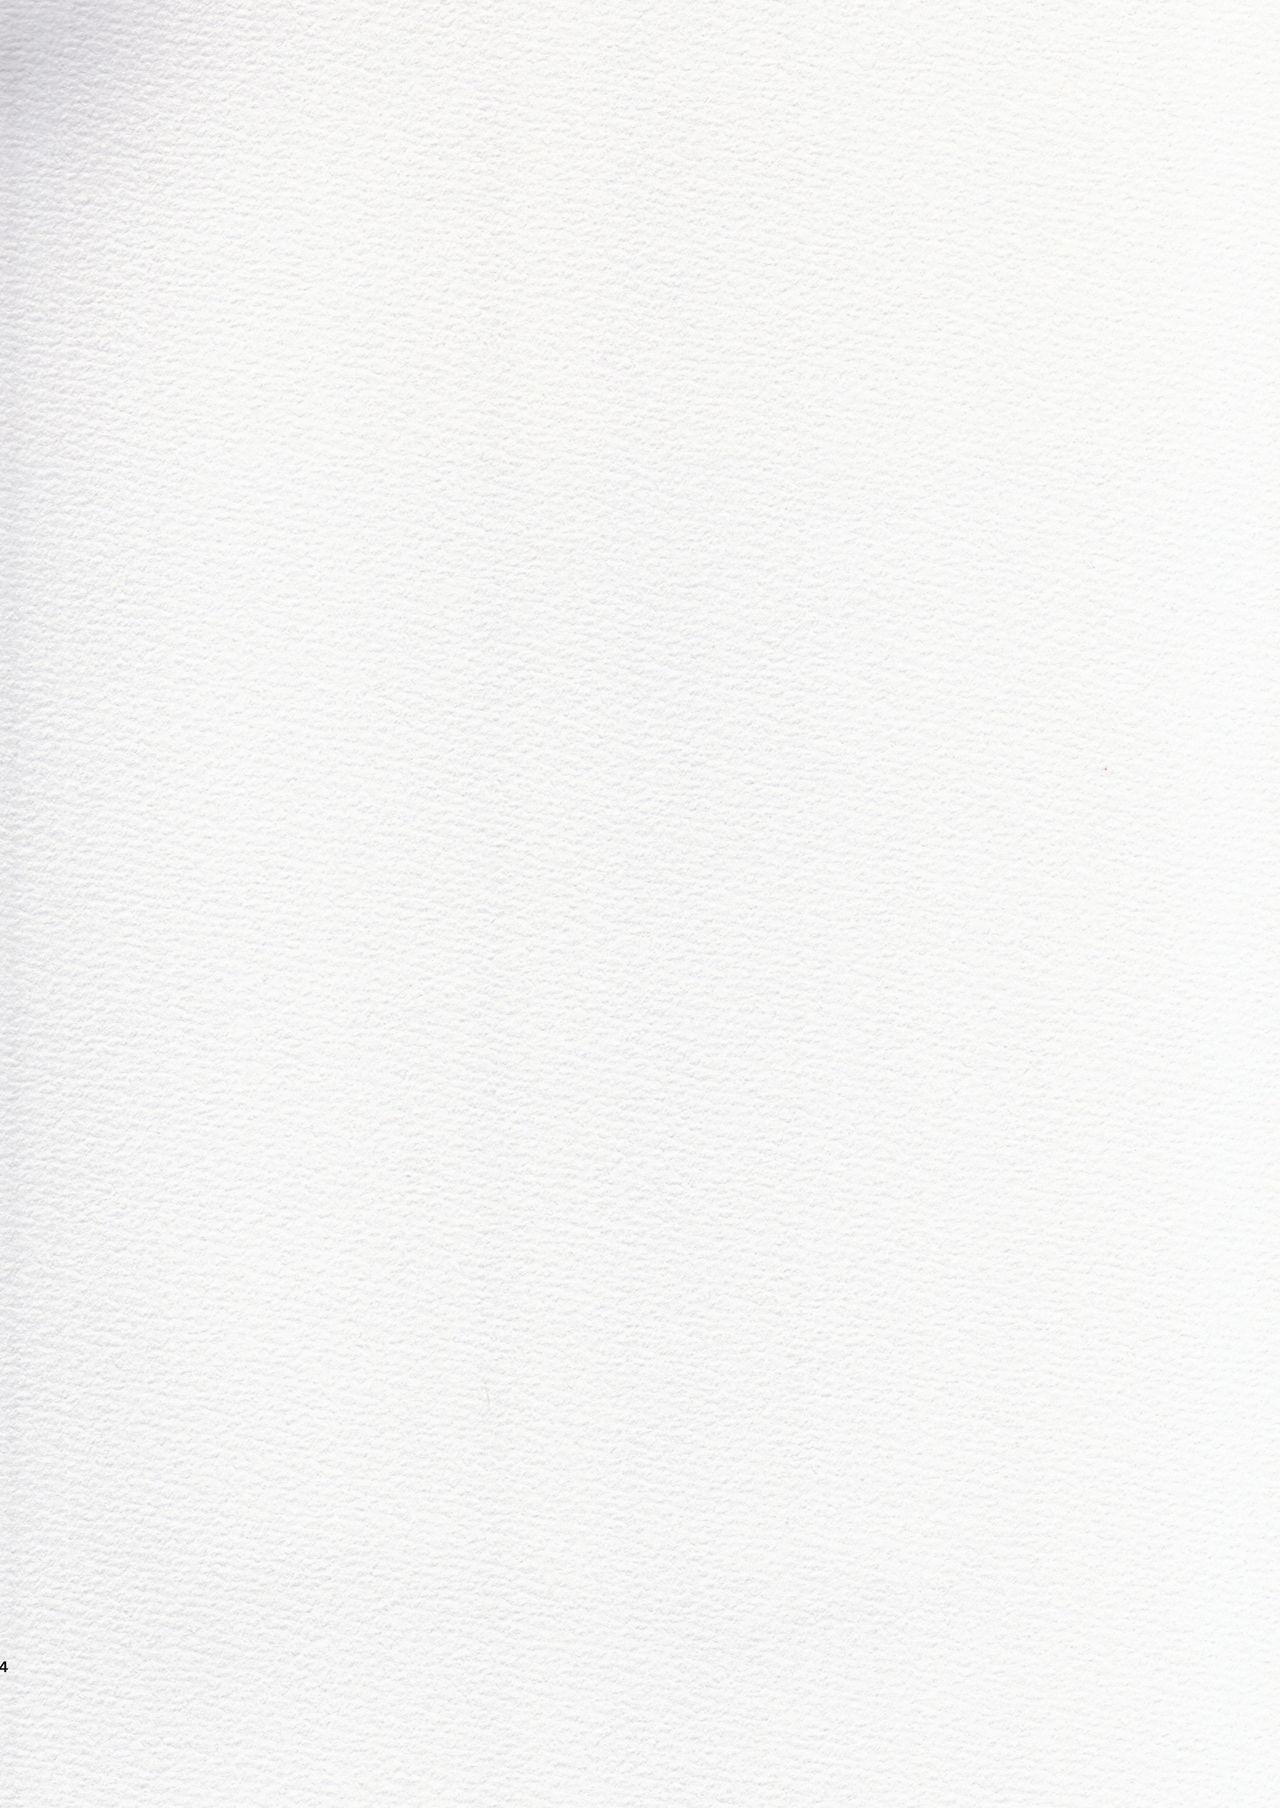 Futanari Osananajimi to Ore to Hajimete no Gyaku Anal Kagai Jugyou 丨扶她青梅竹馬和我第一次的反向小穴做愛課外授課 4